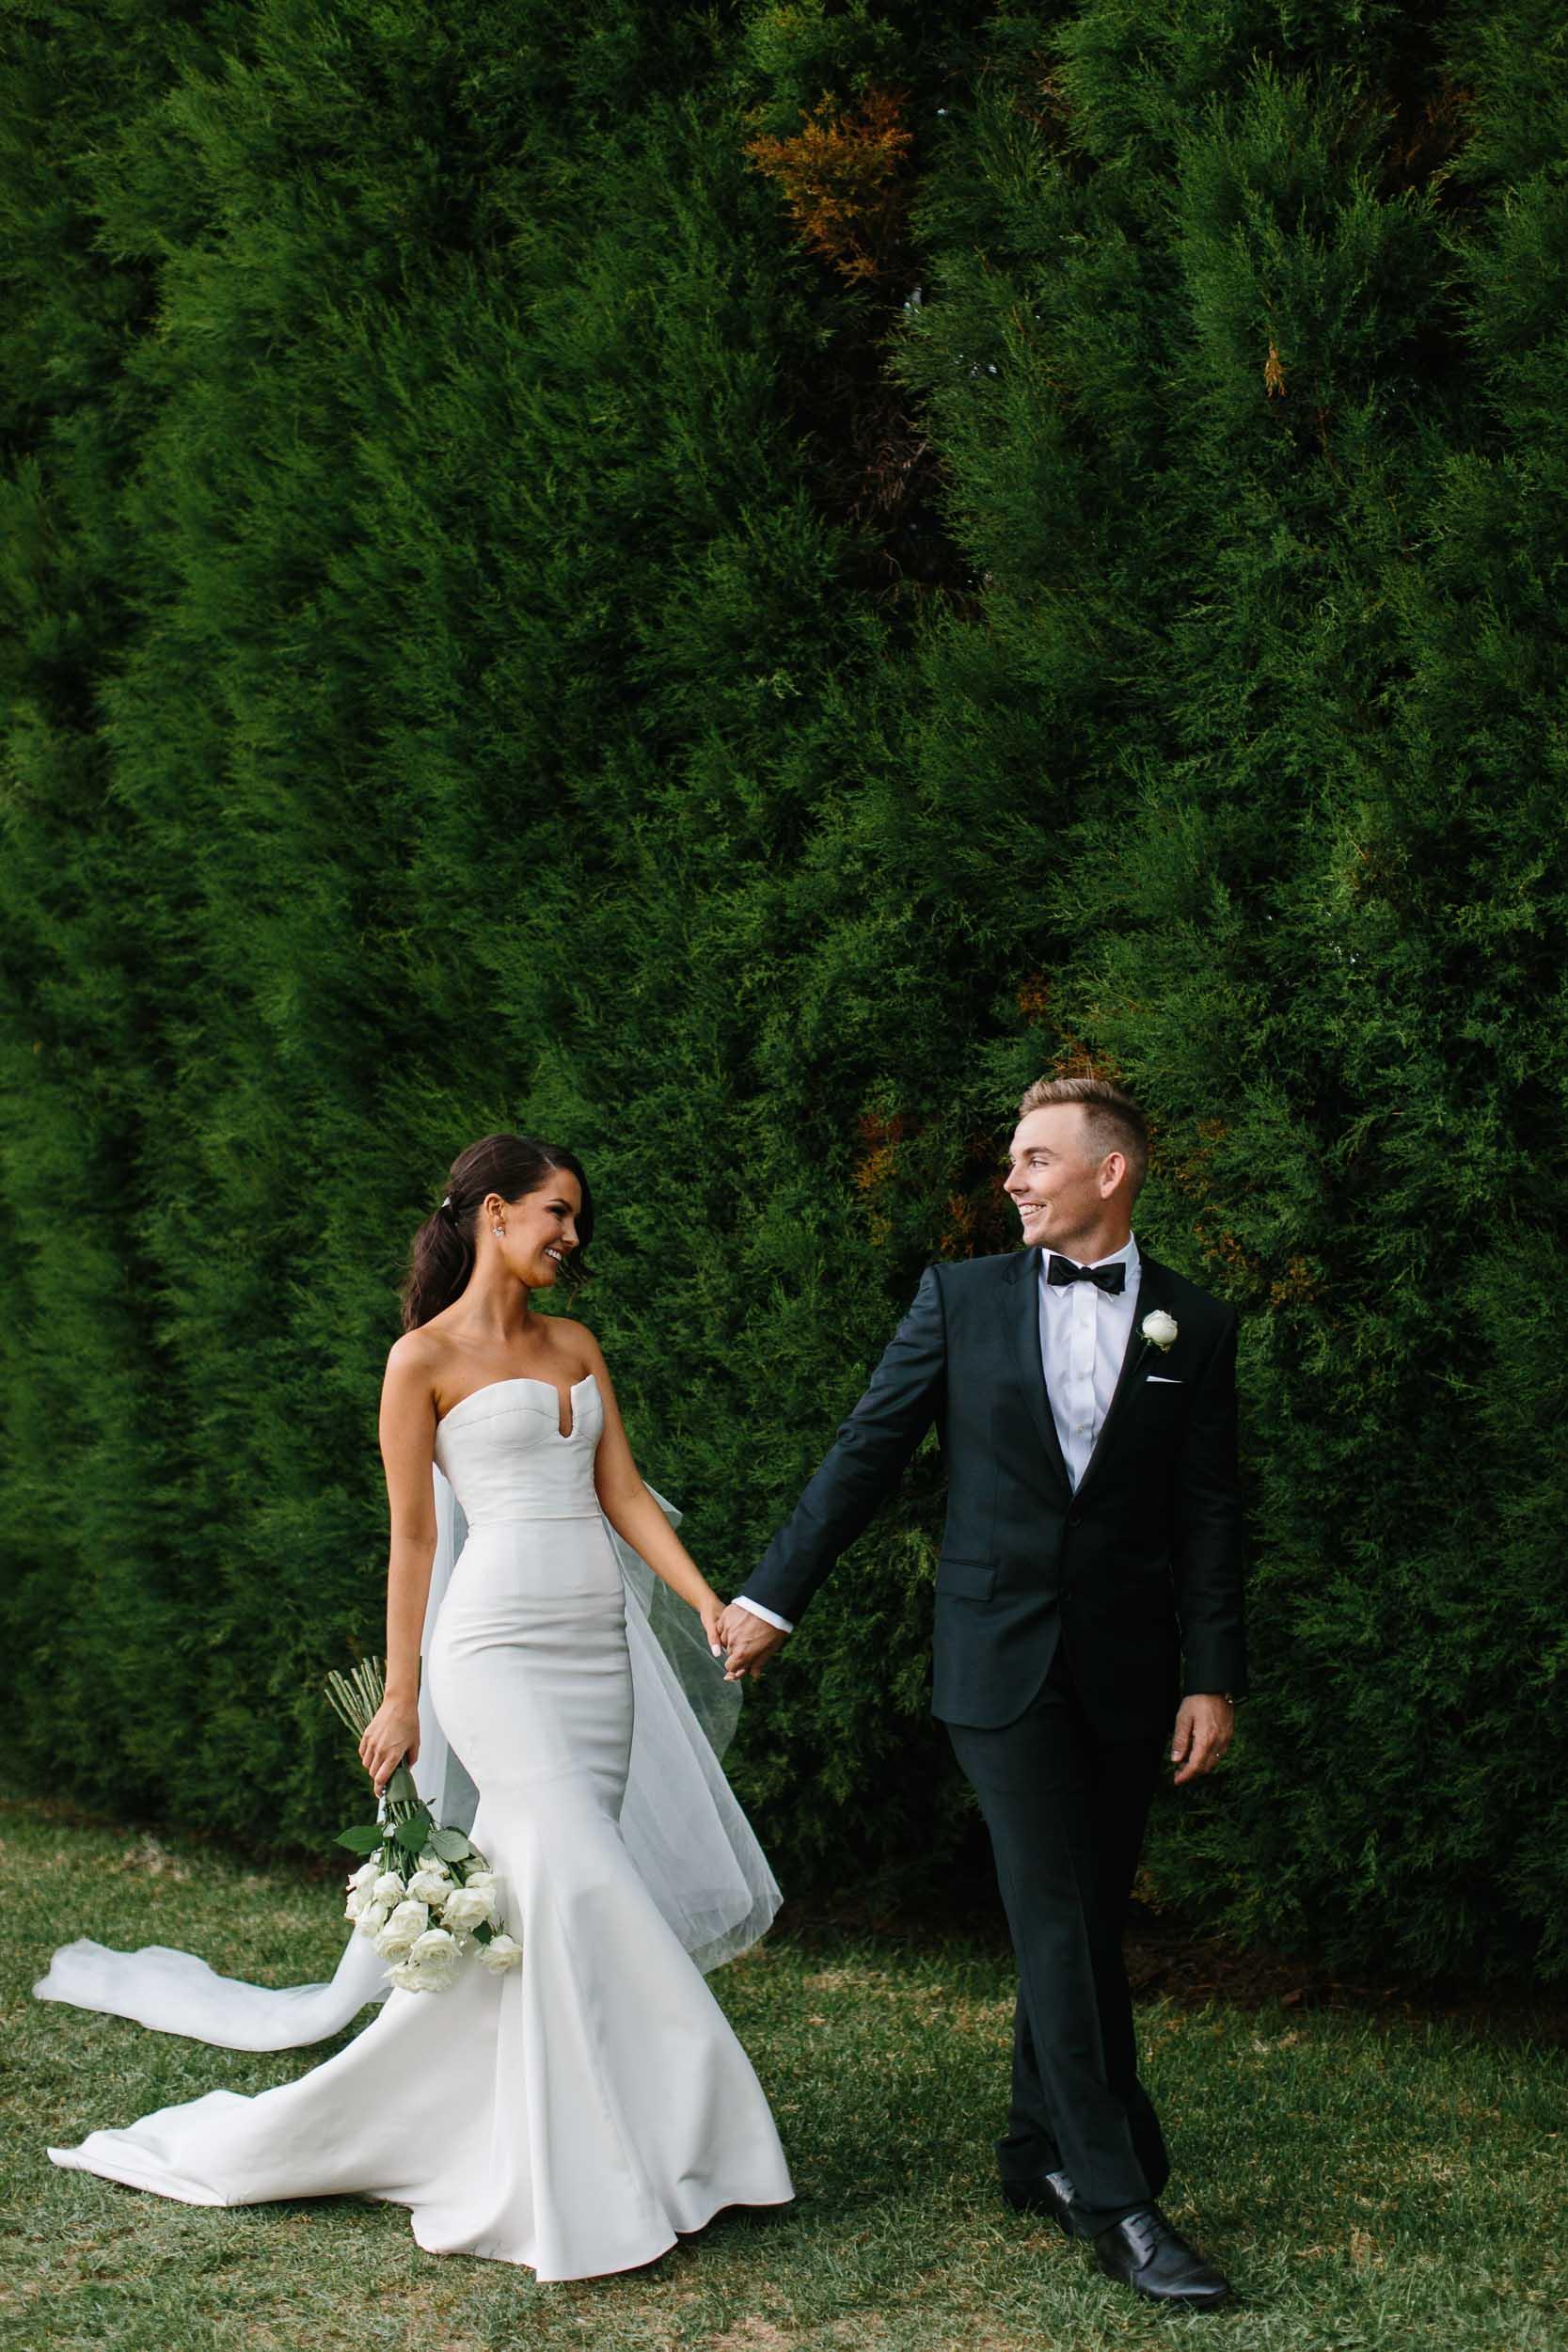 Kas-Richards-Melbourne-Garden-Wedding-Aerial-South-Whark-Georgia-Young-Couture-320.jpg